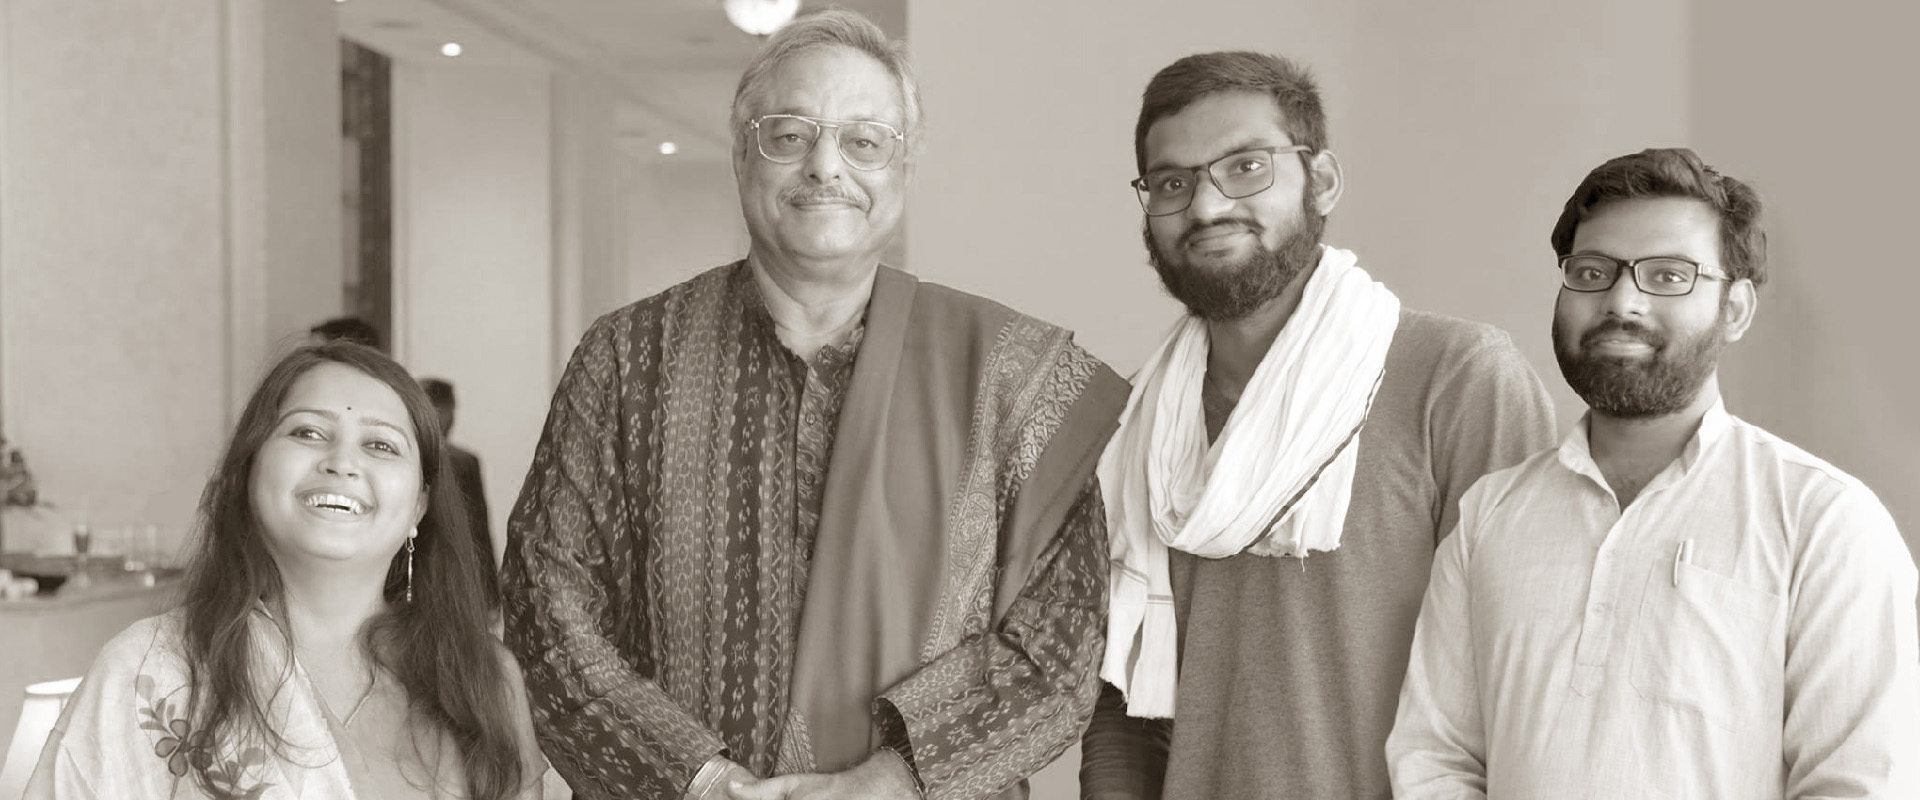 Gap Sap with Siddharth Kak